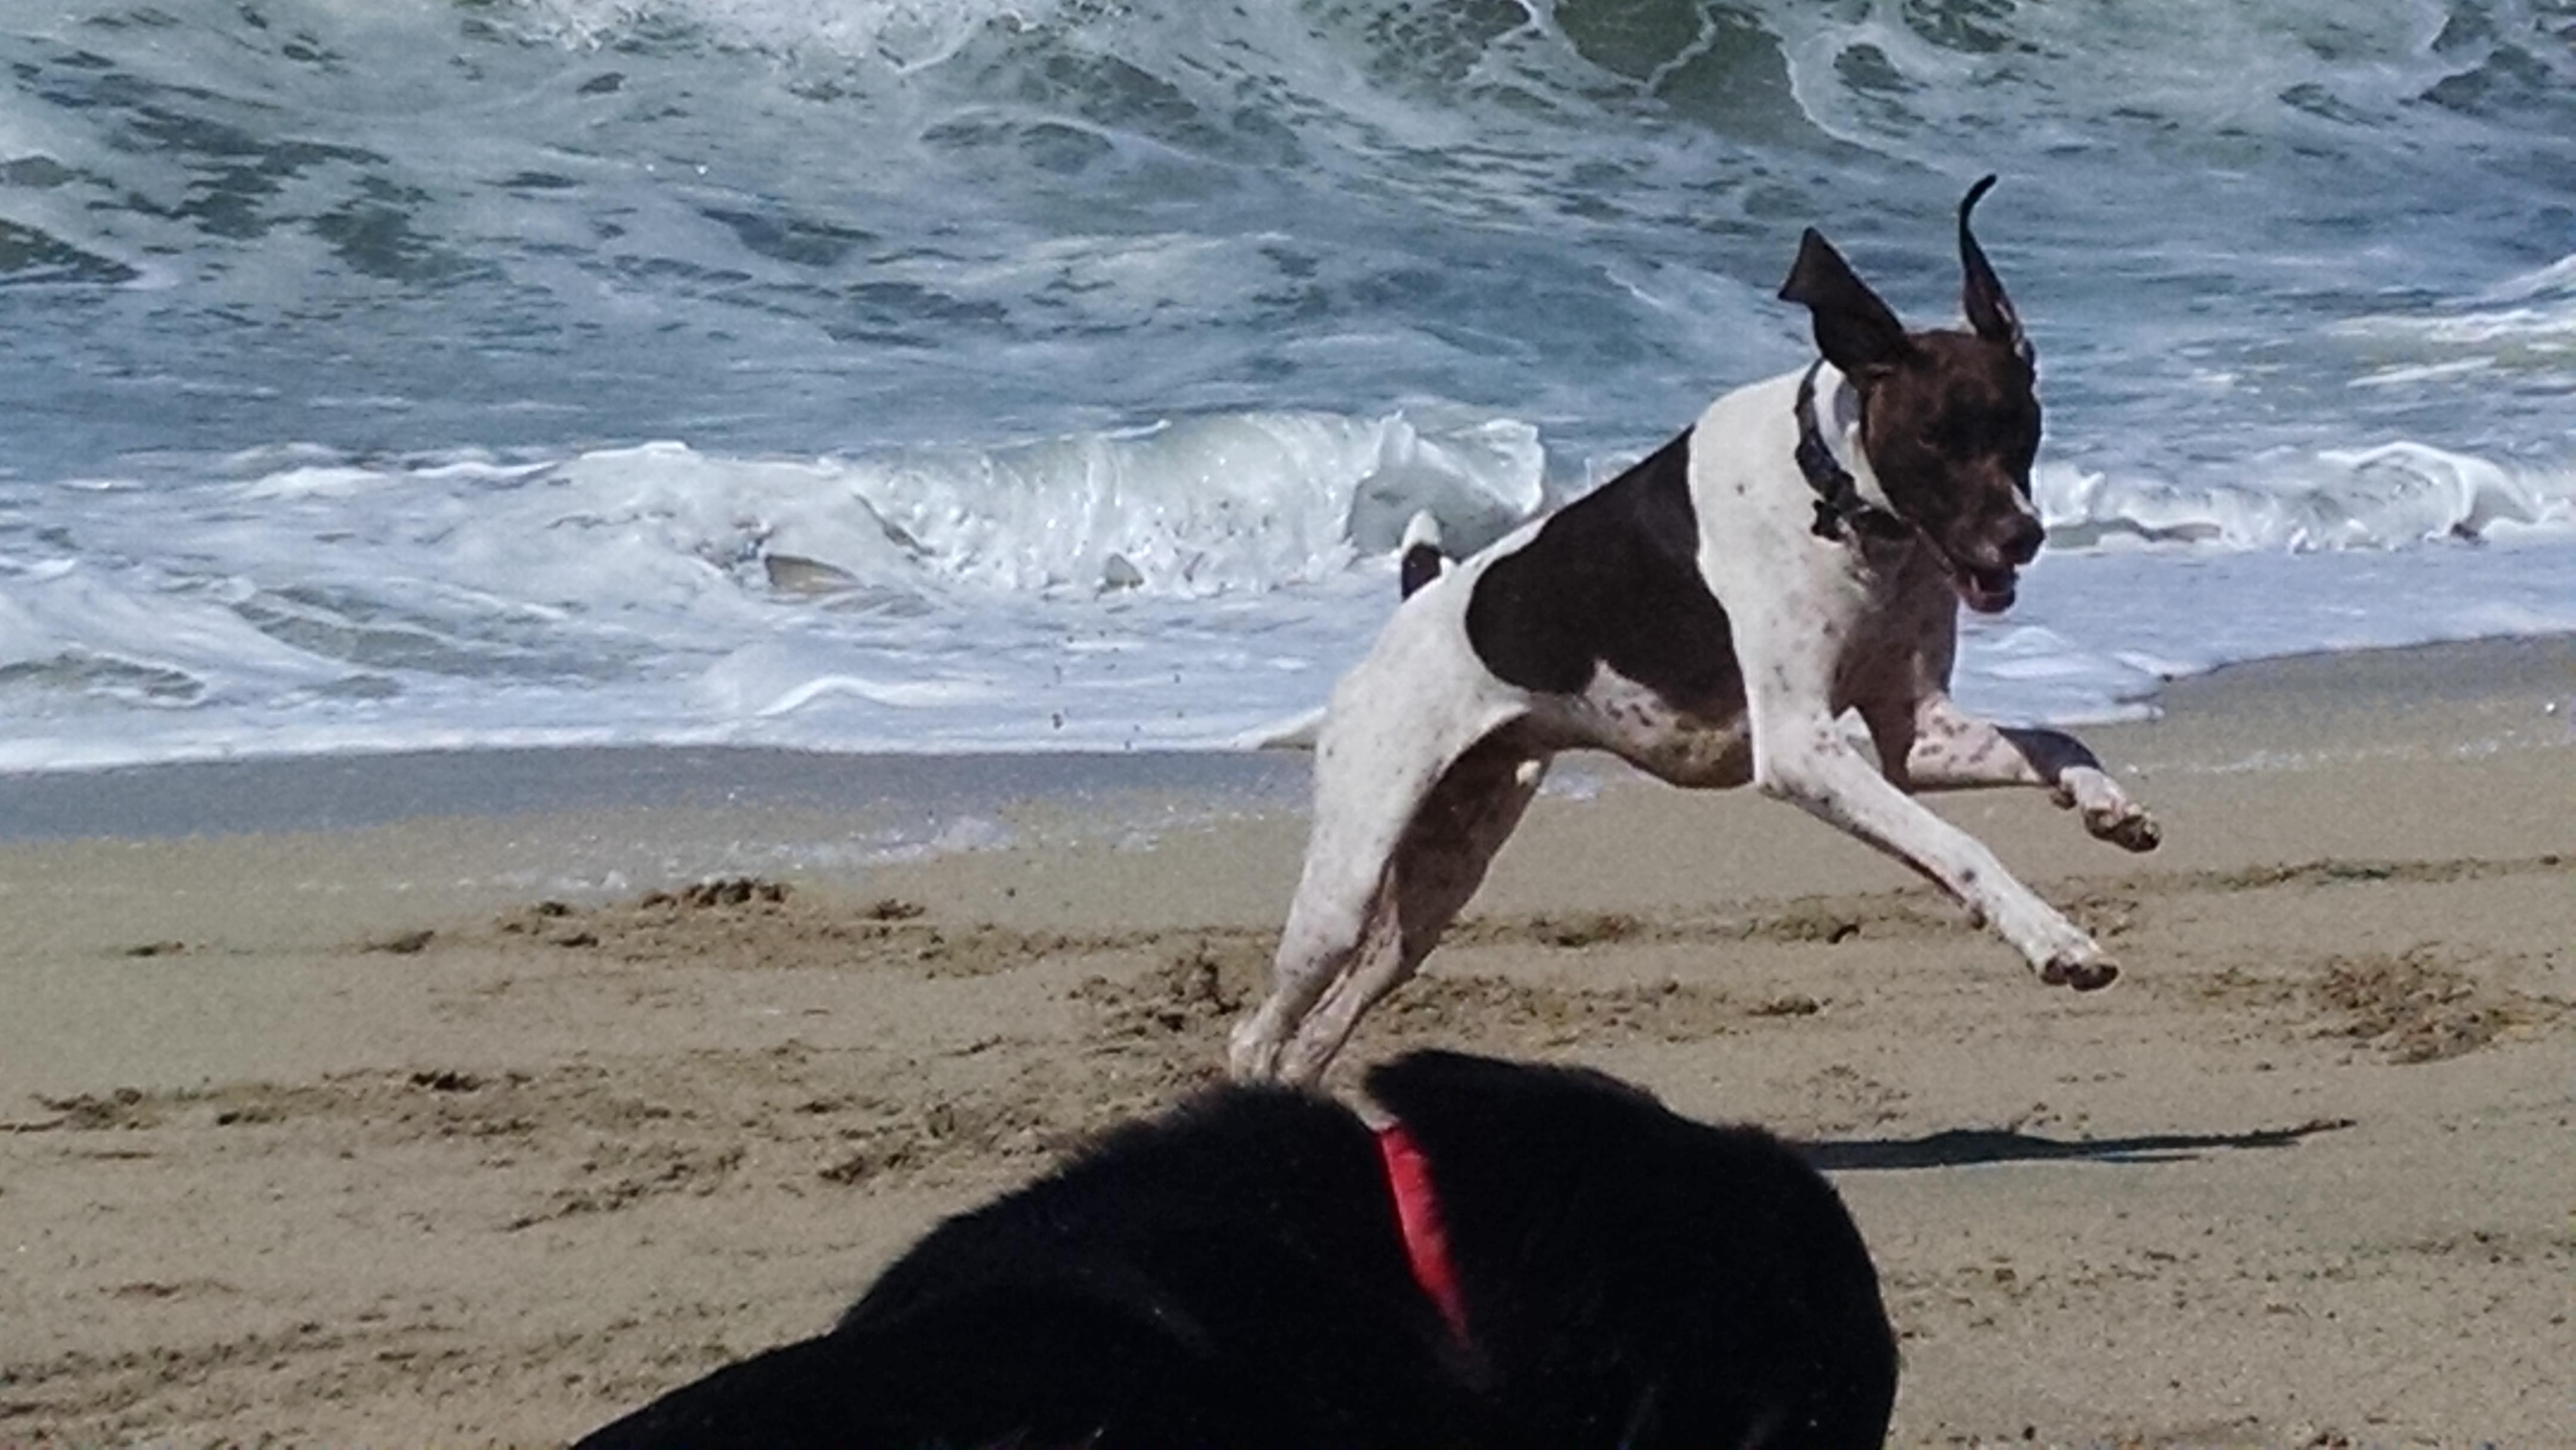 Toby, sooooo much energy!